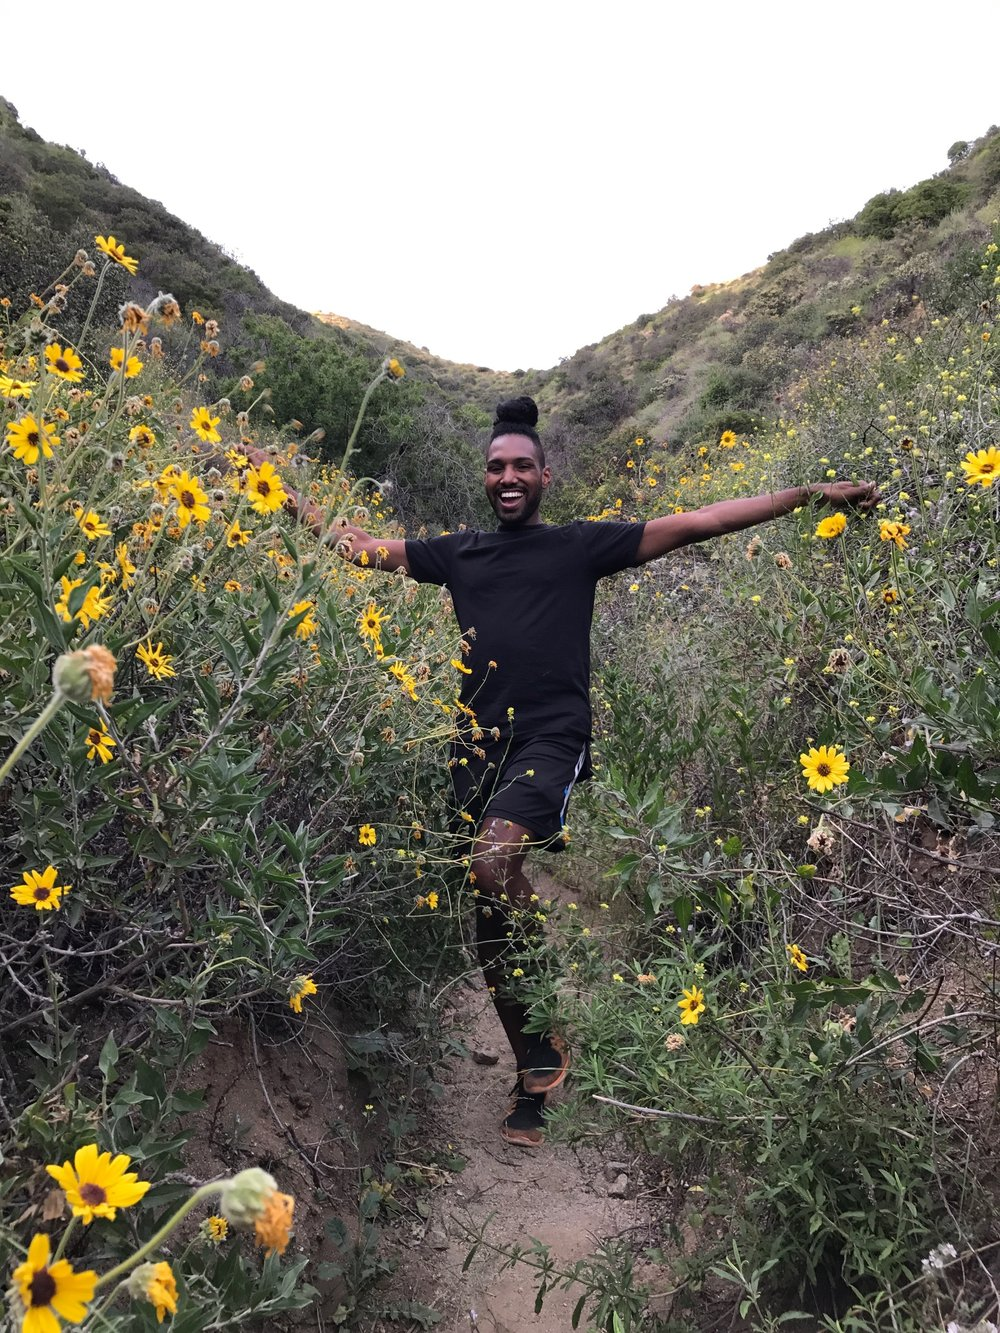 Patrick on a hike.